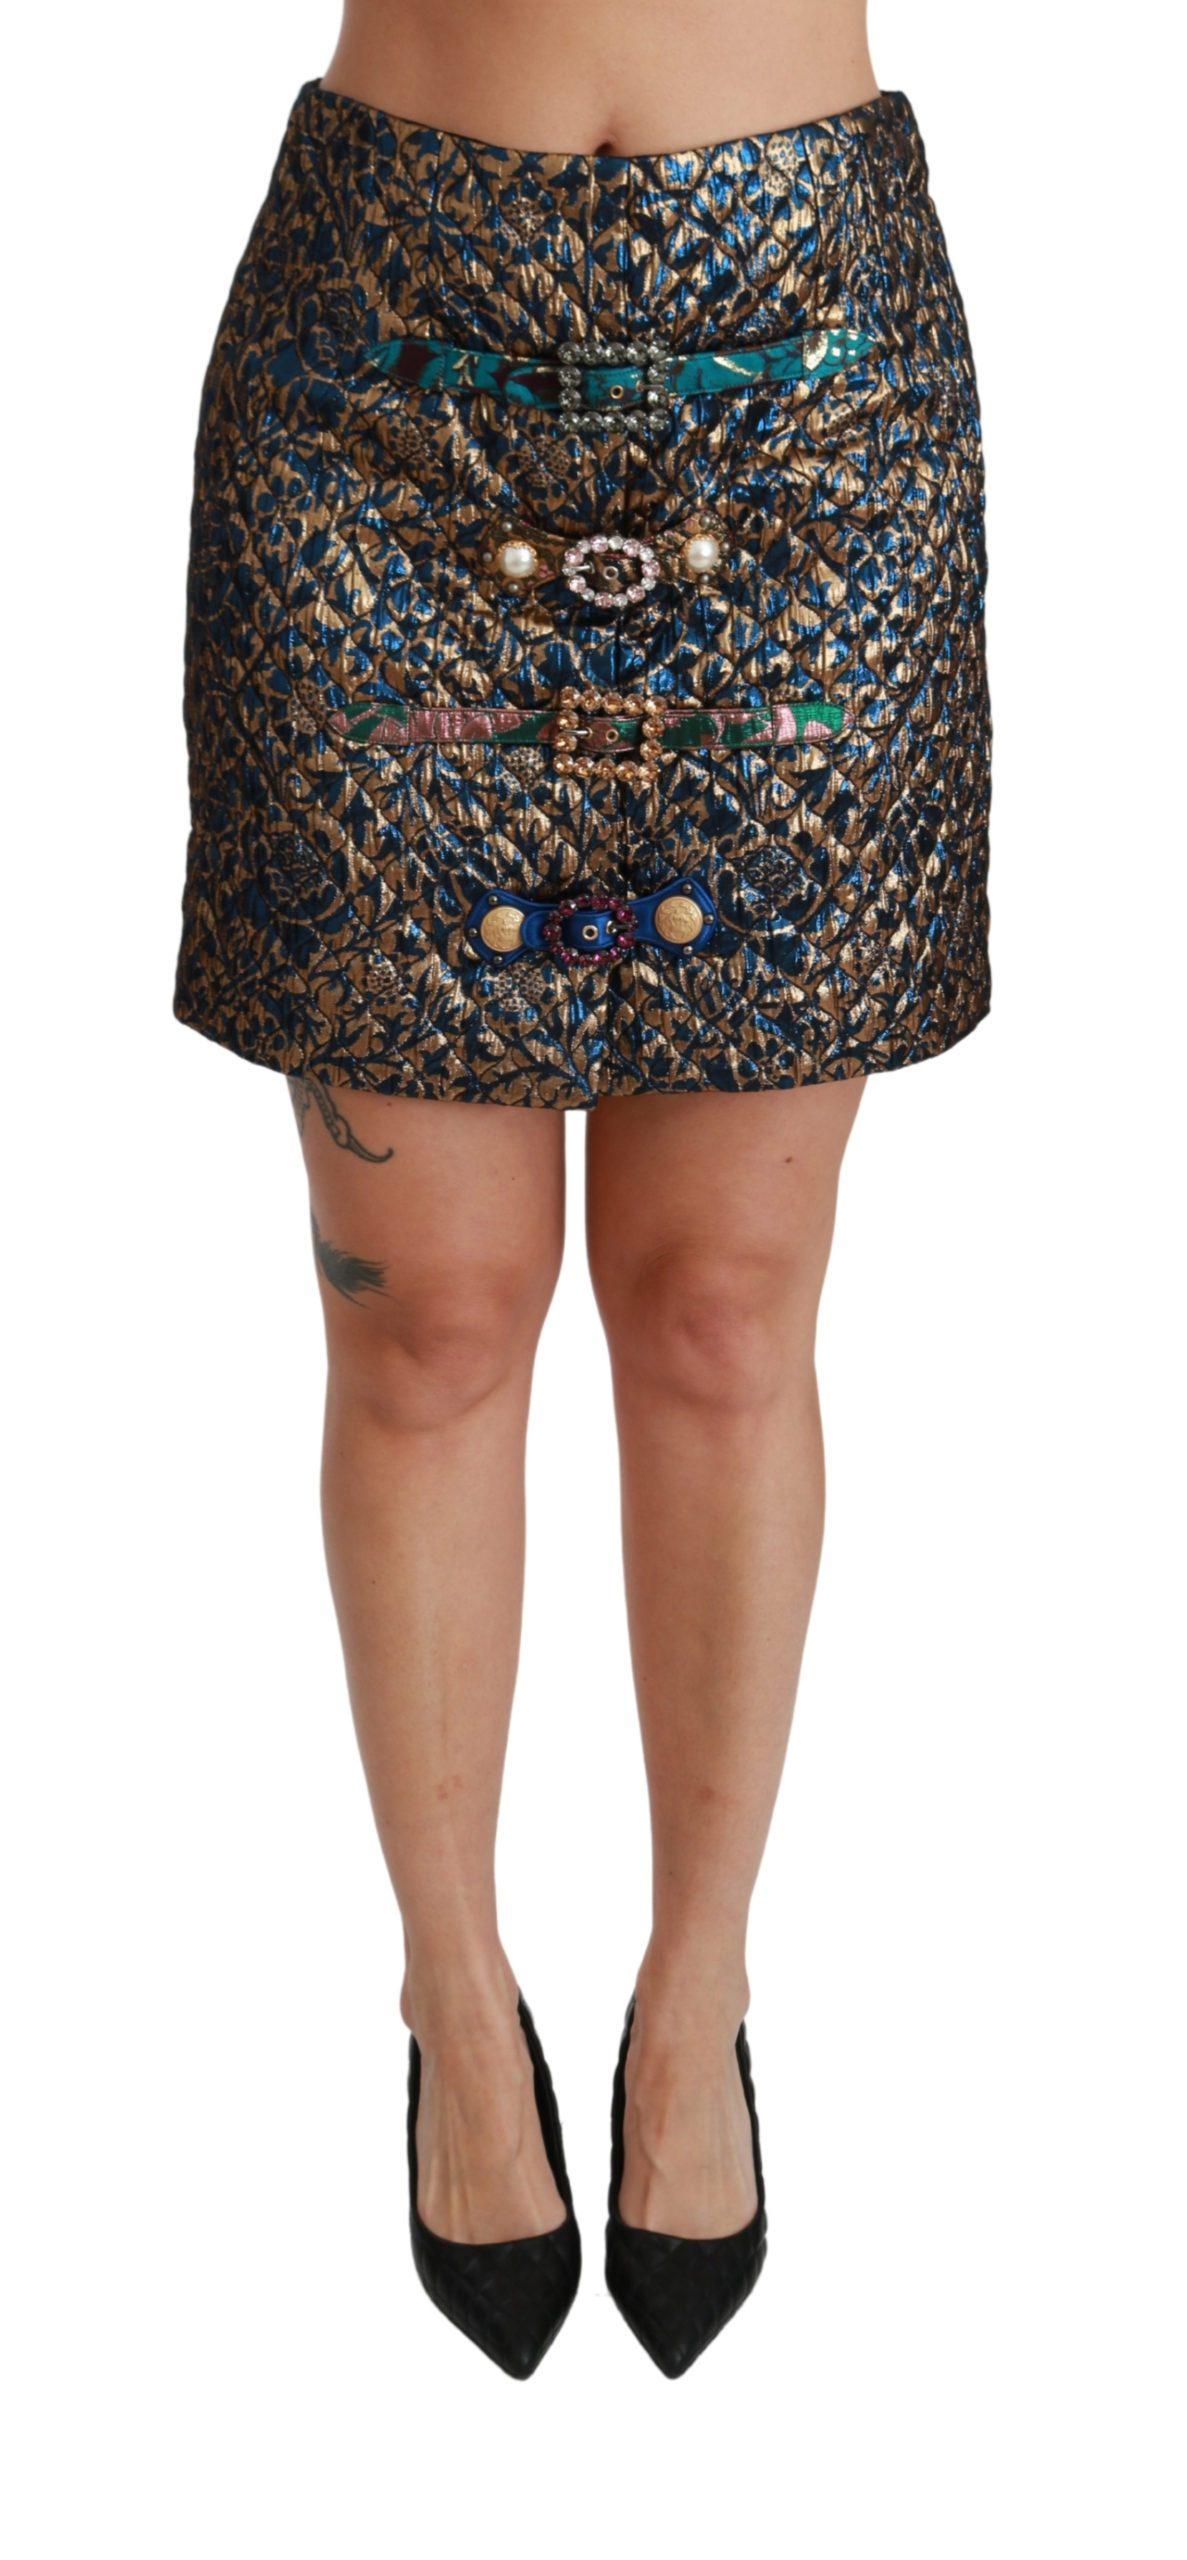 Dolce & Gabbana Women's Jacquard Crystal Mini Skirt Blue SKI1404 - IT42|M